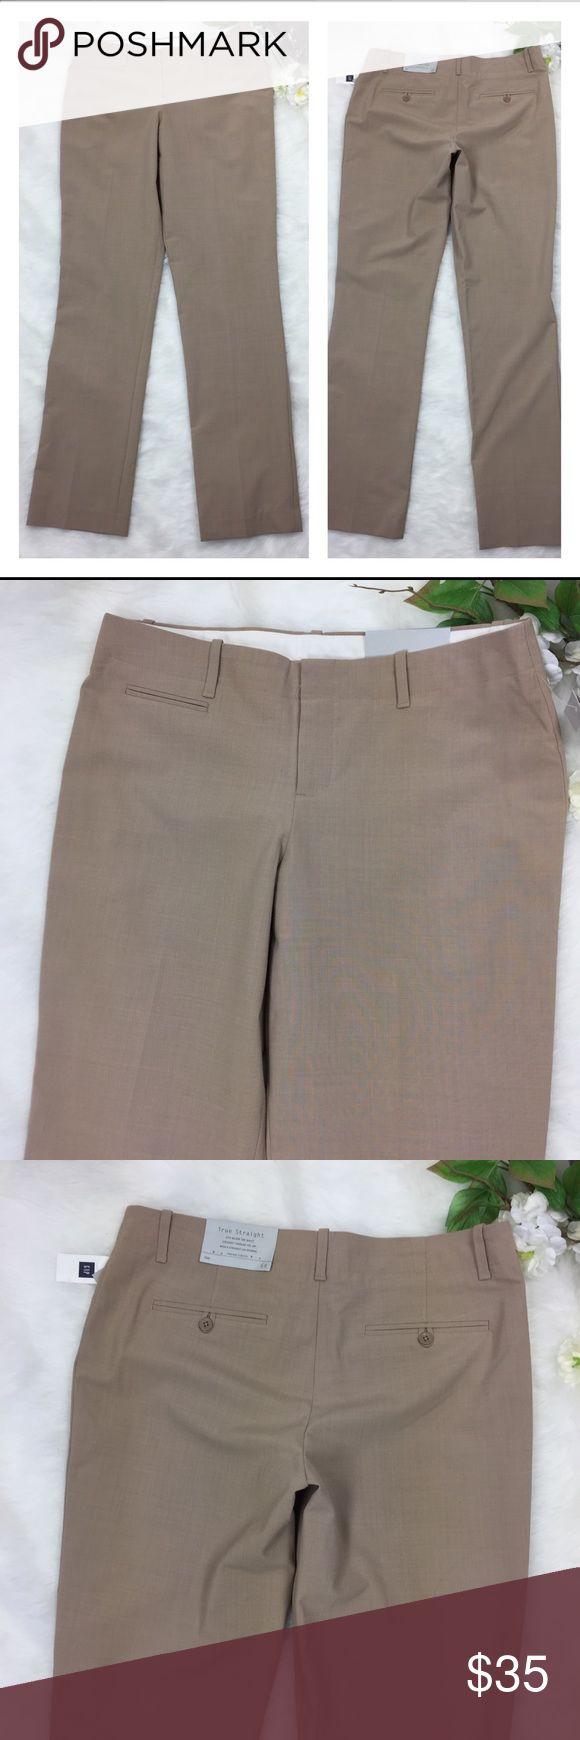 "Gap Trousers True Straight Pants Tan Size 6 Reg Gap Trousers career work slacks size 6 regular.  Gap true straight leg pants in Tan new with tags. Measurements flat  Rise 9"" Waist 16"" Inseam 33"" Location R11 GAP Pants Trousers"